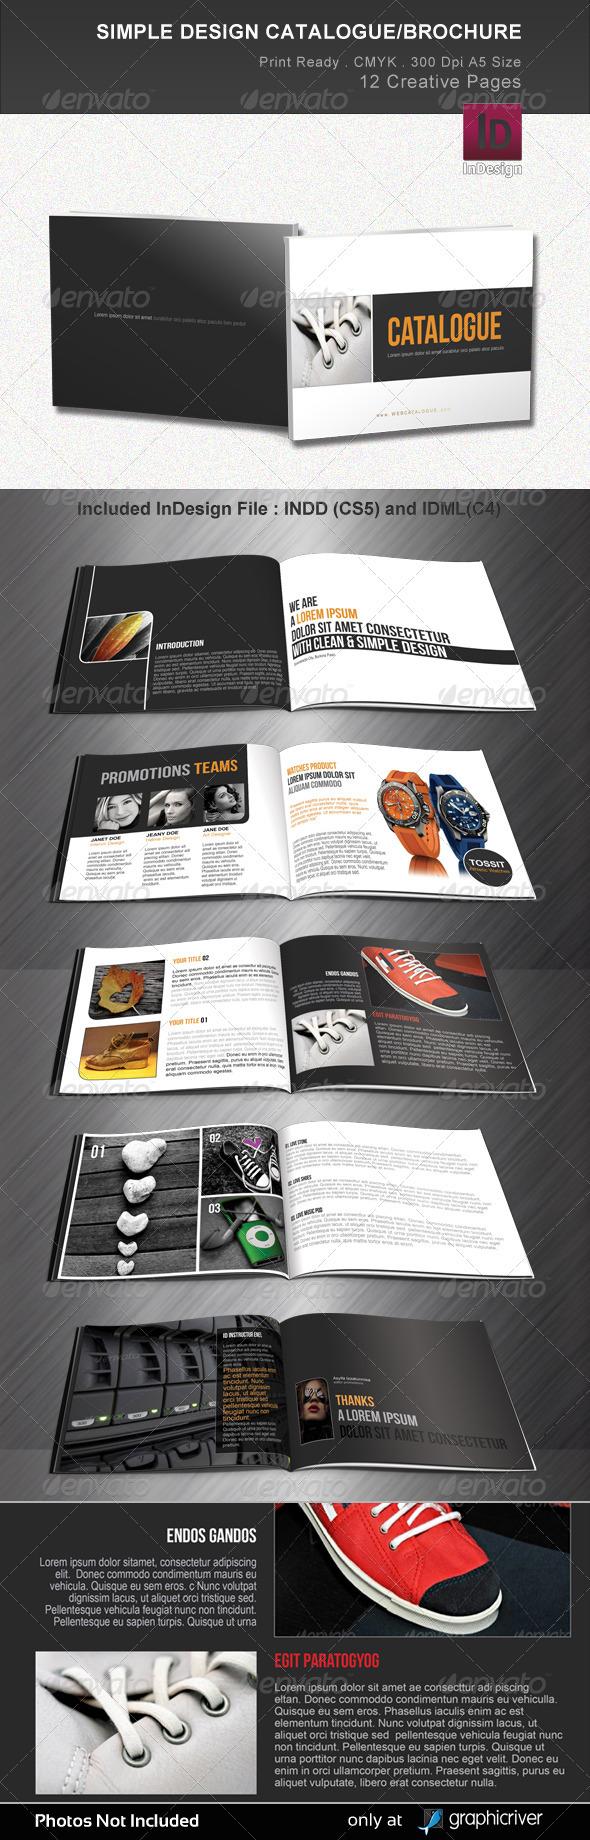 GraphicRiver Simple Design Catalogue Brochure 2387243